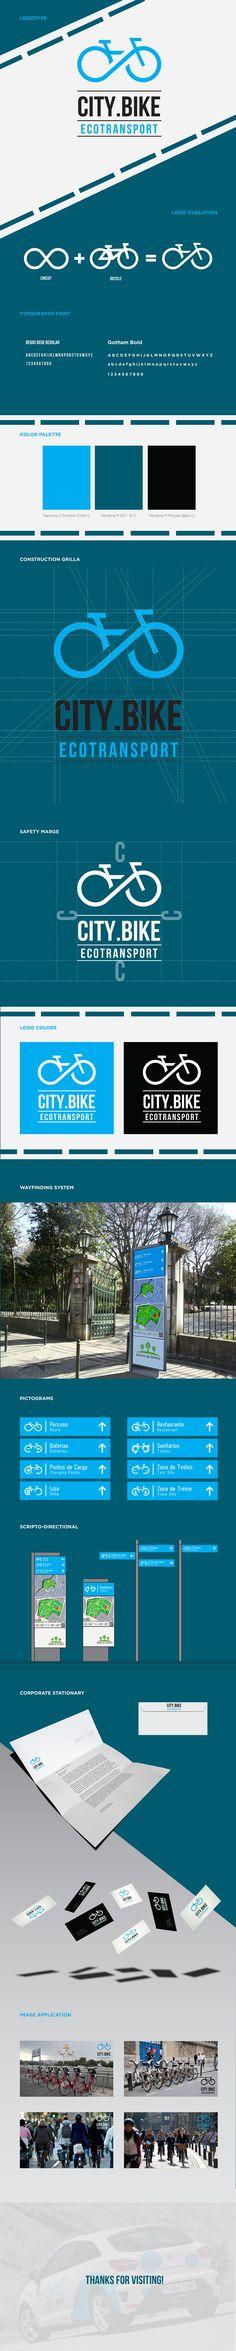 CITY.BIKE on Behance